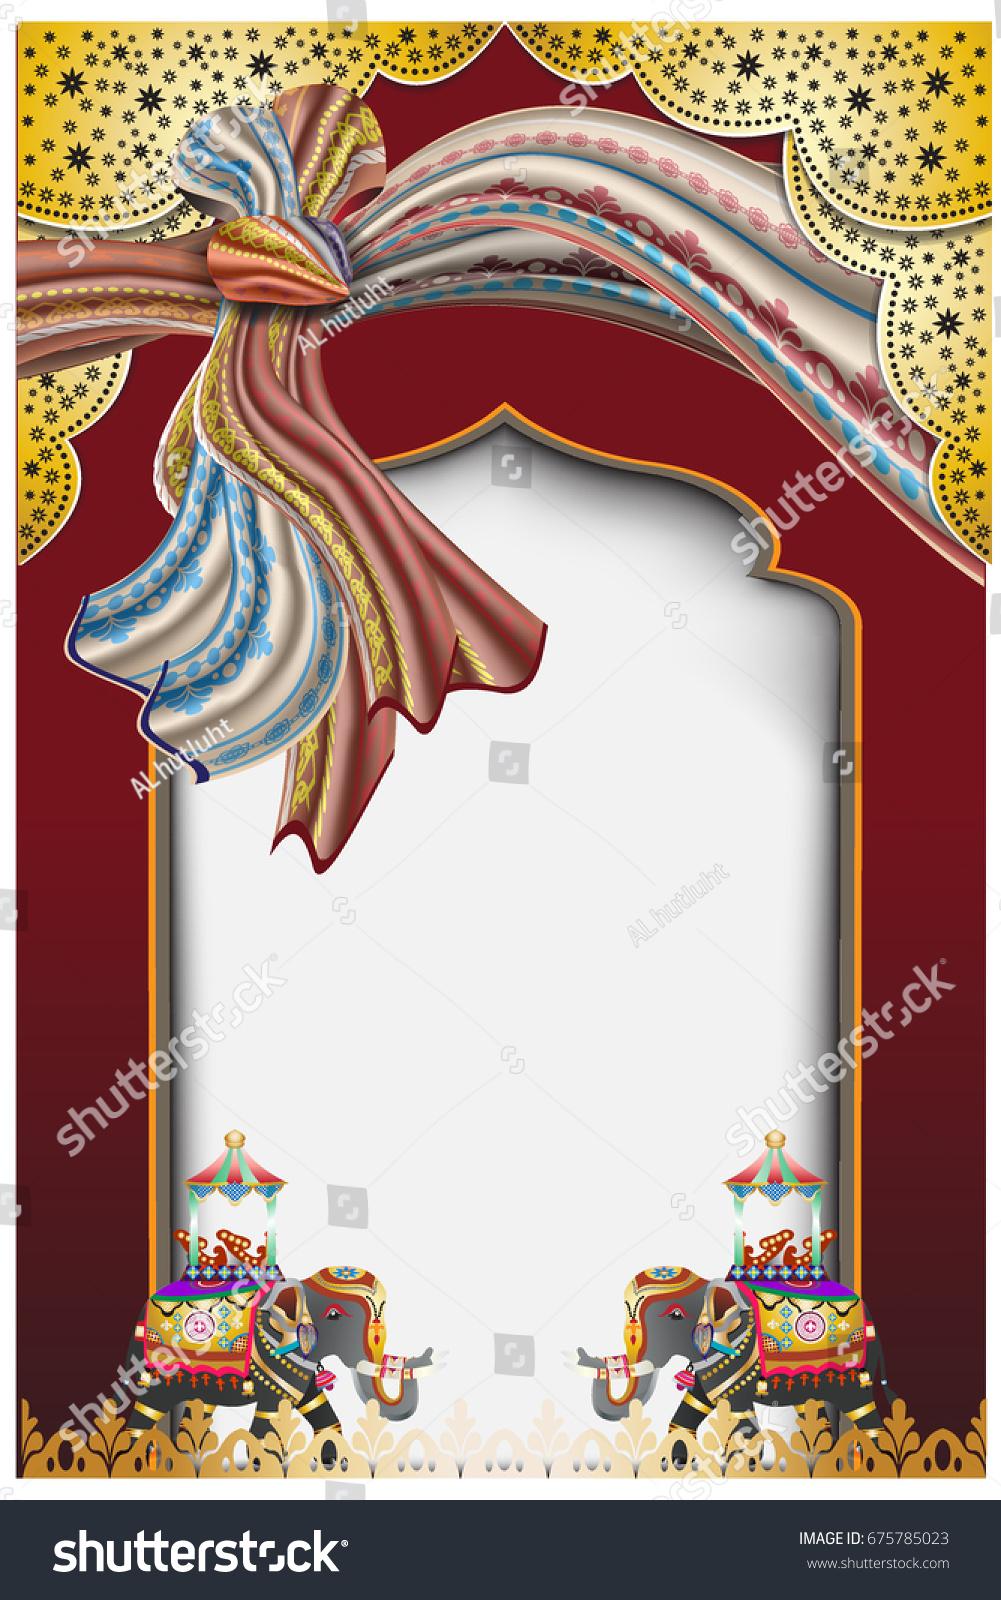 Hindu Wedding Knot Tied Man Woman Stock Vector (Royalty Free ...